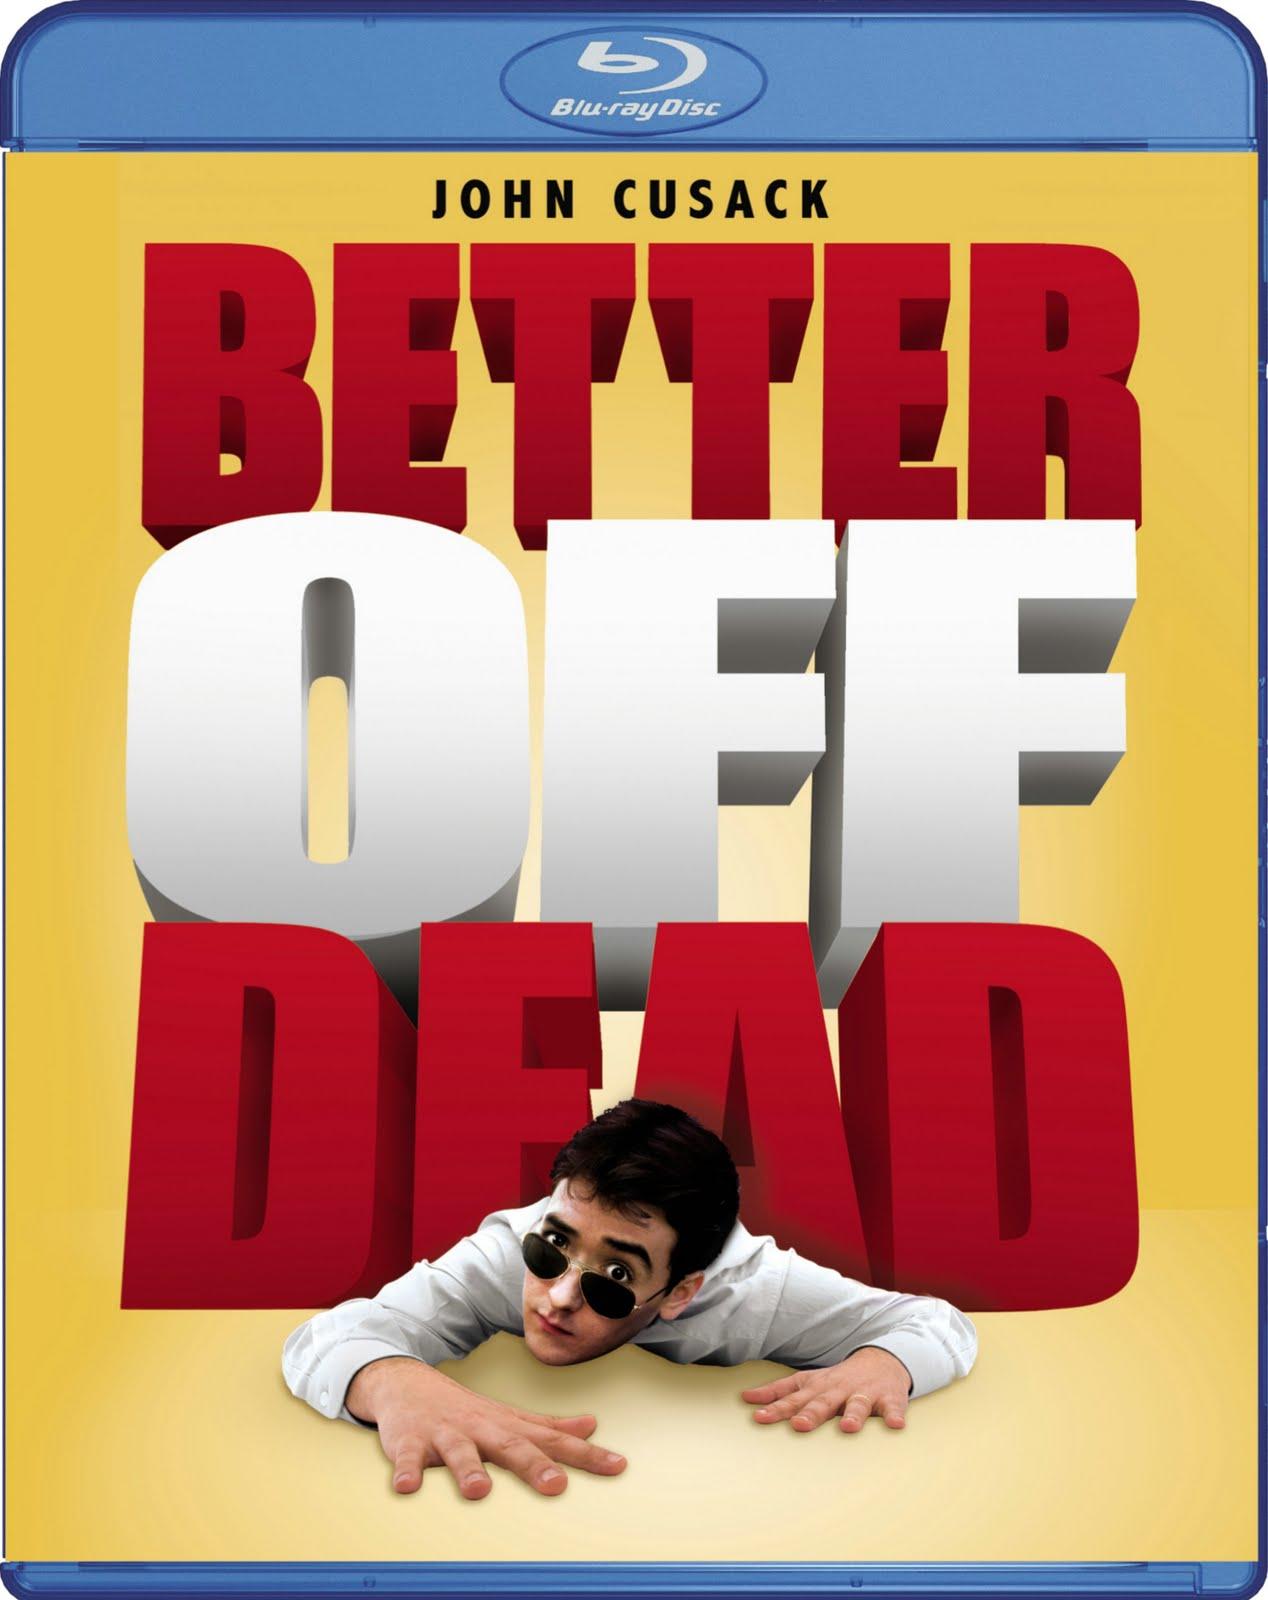 http://4.bp.blogspot.com/-d2tqbcAcxn4/Tj8sGV95yTI/AAAAAAAAFHA/JSUMP9ab6ZA/s1600/Better-Off-Dead-Blu-ray-cover.jpg